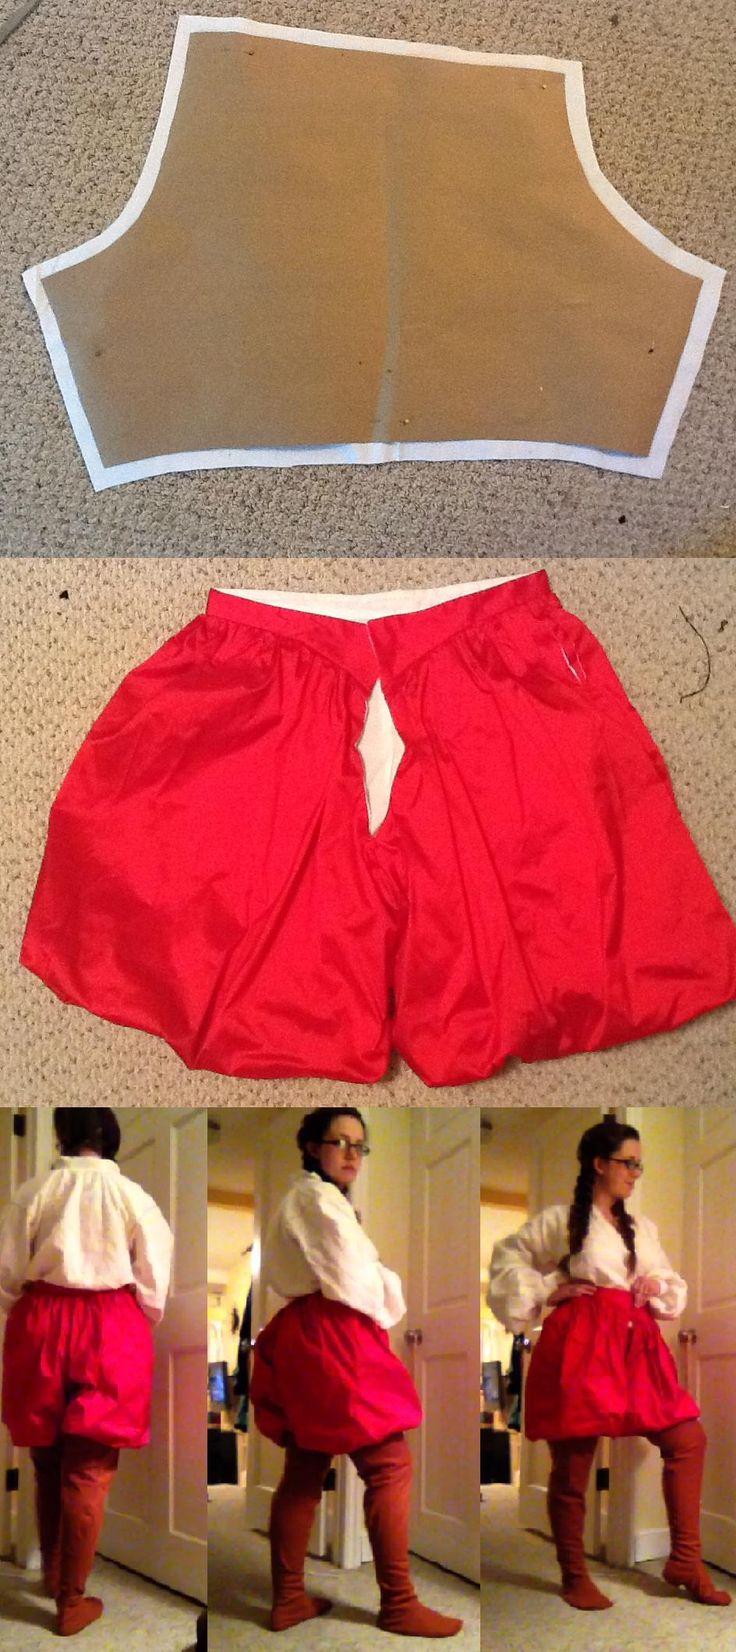 Italian Ren poofy pants